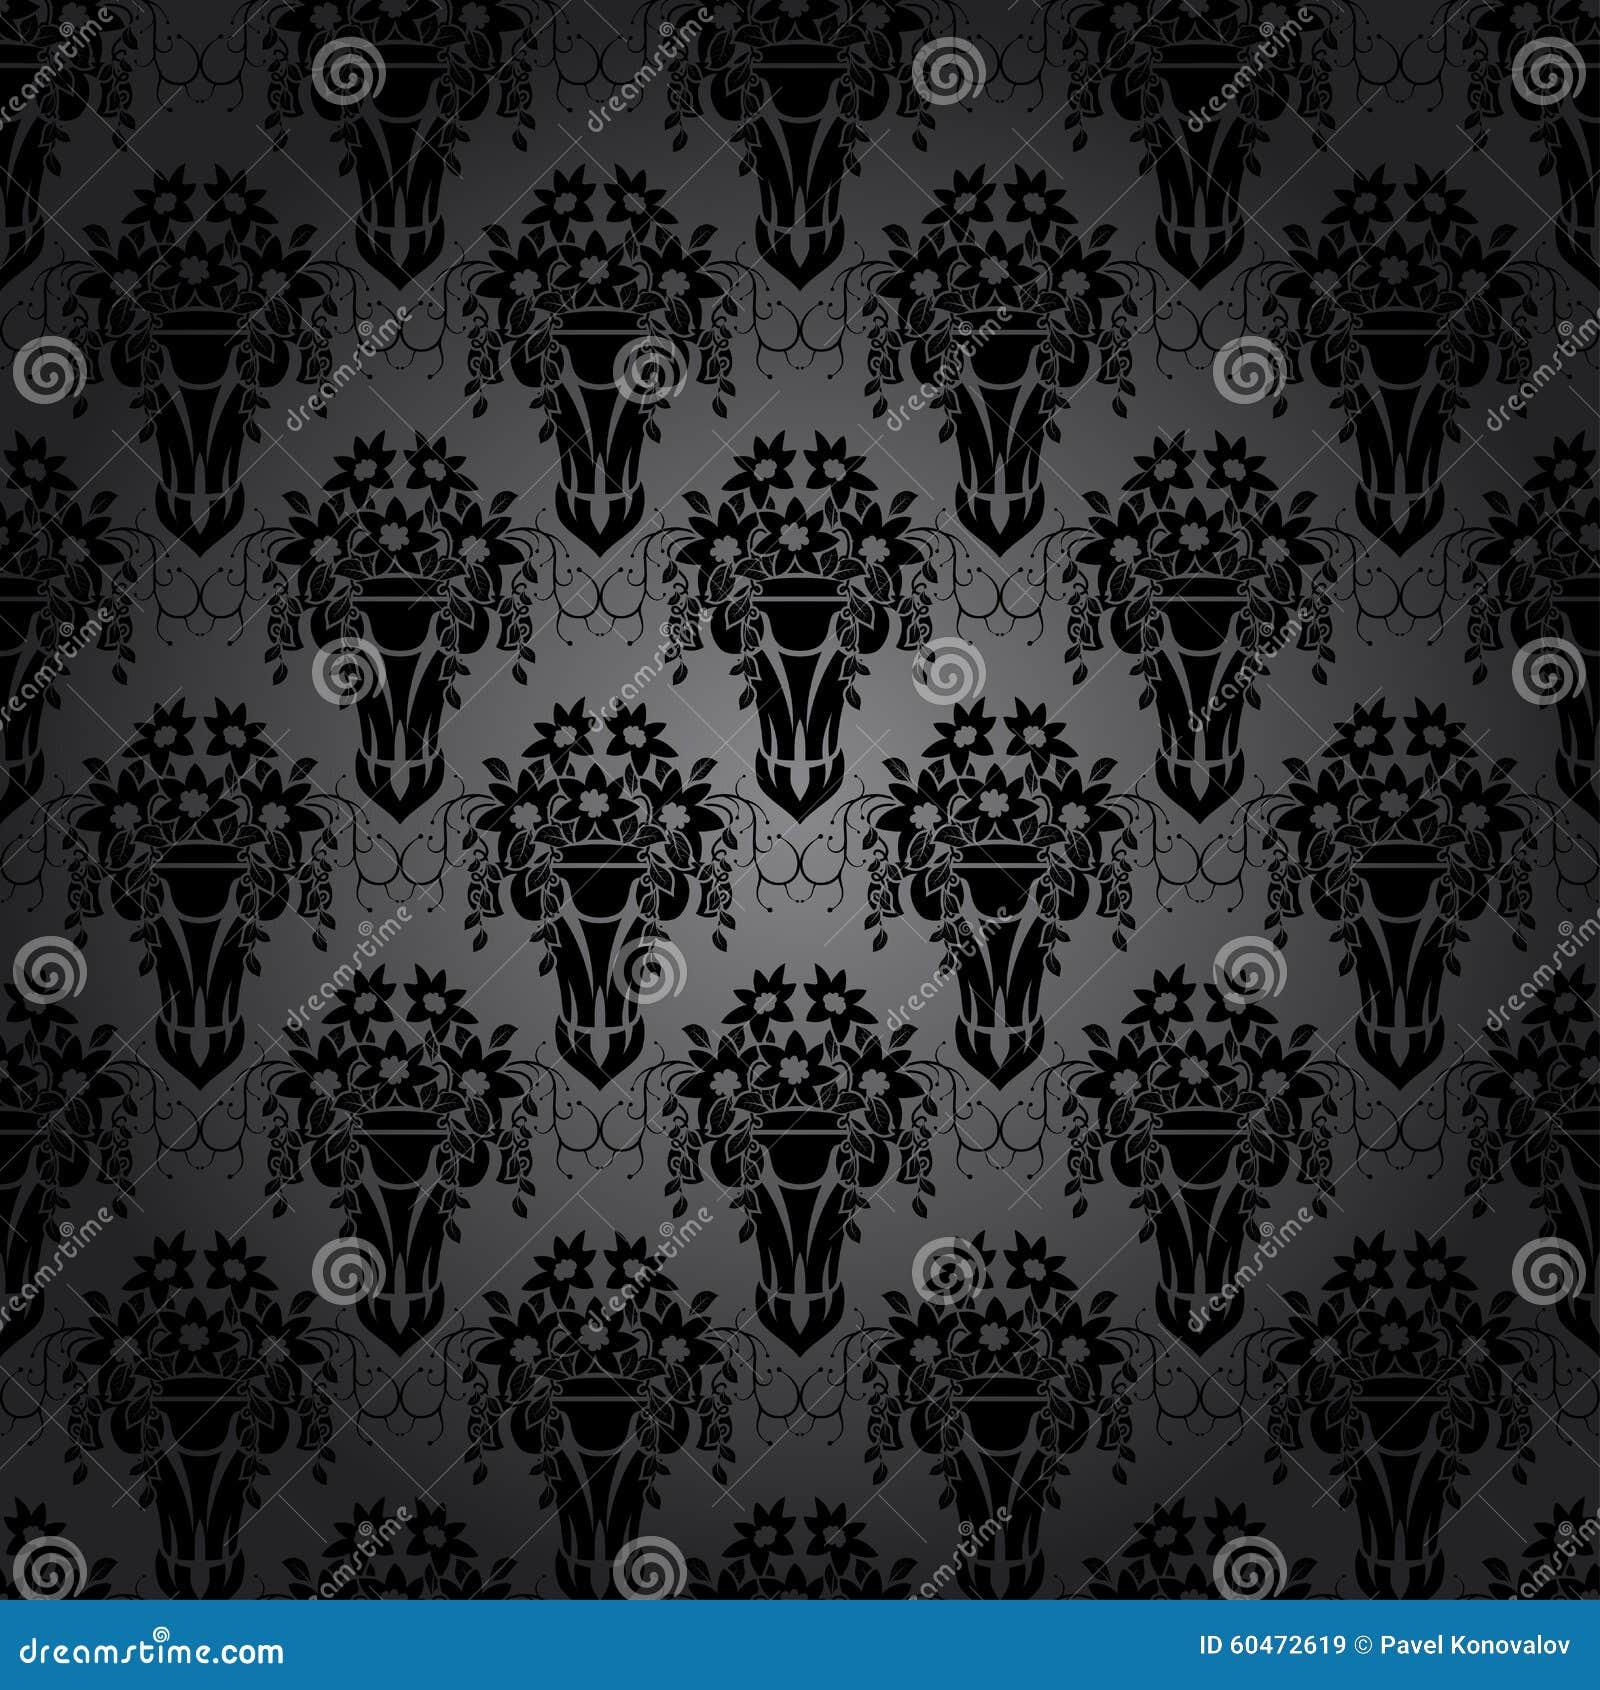 swirling royal pattern wallpaper - photo #22